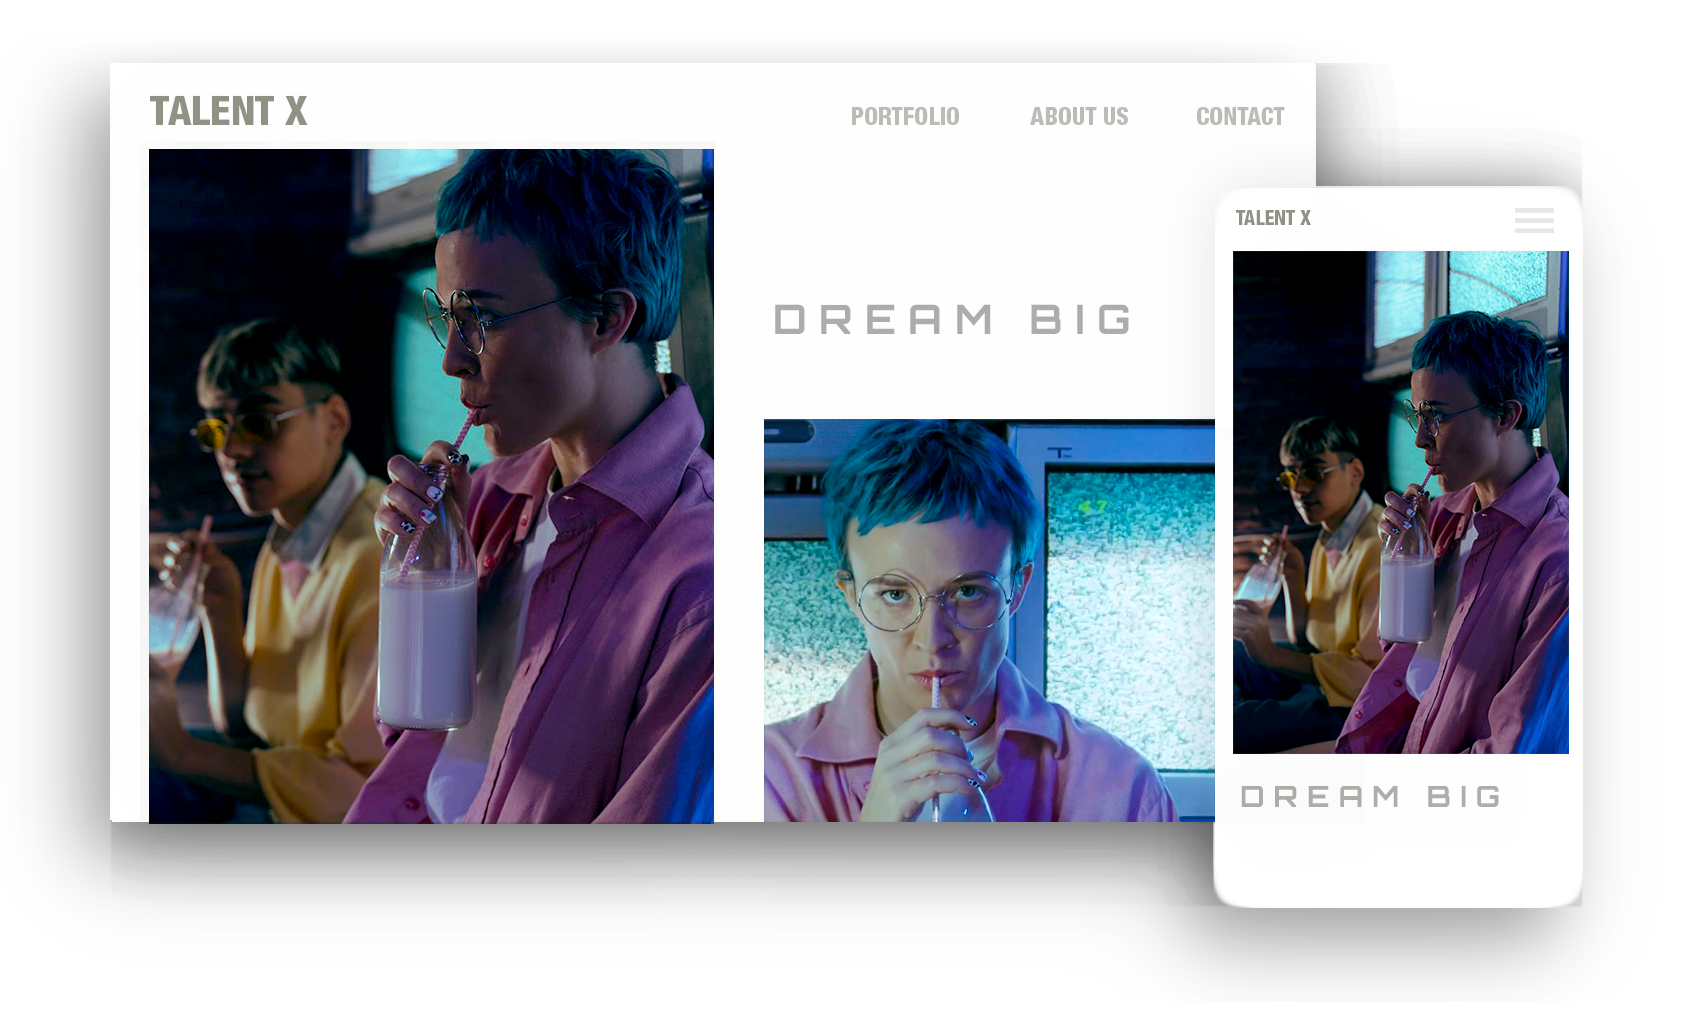 webdesign homepage image 4''